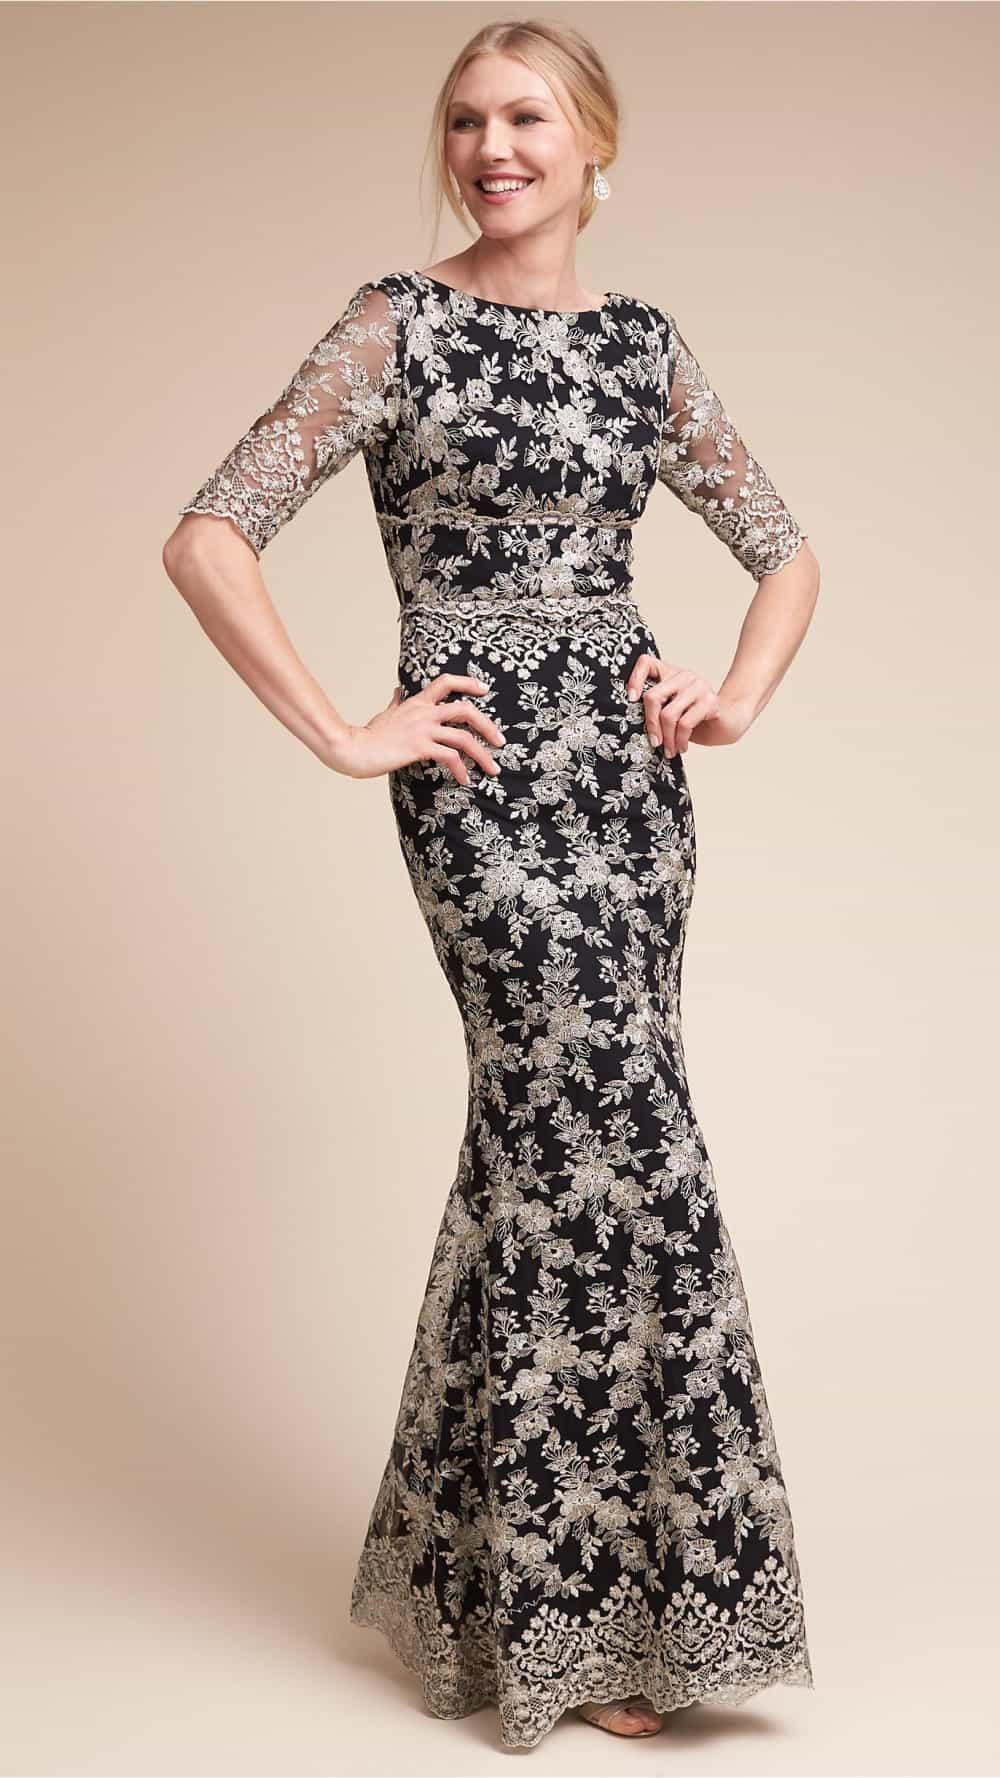 Black Dresses for Weddings Mother's